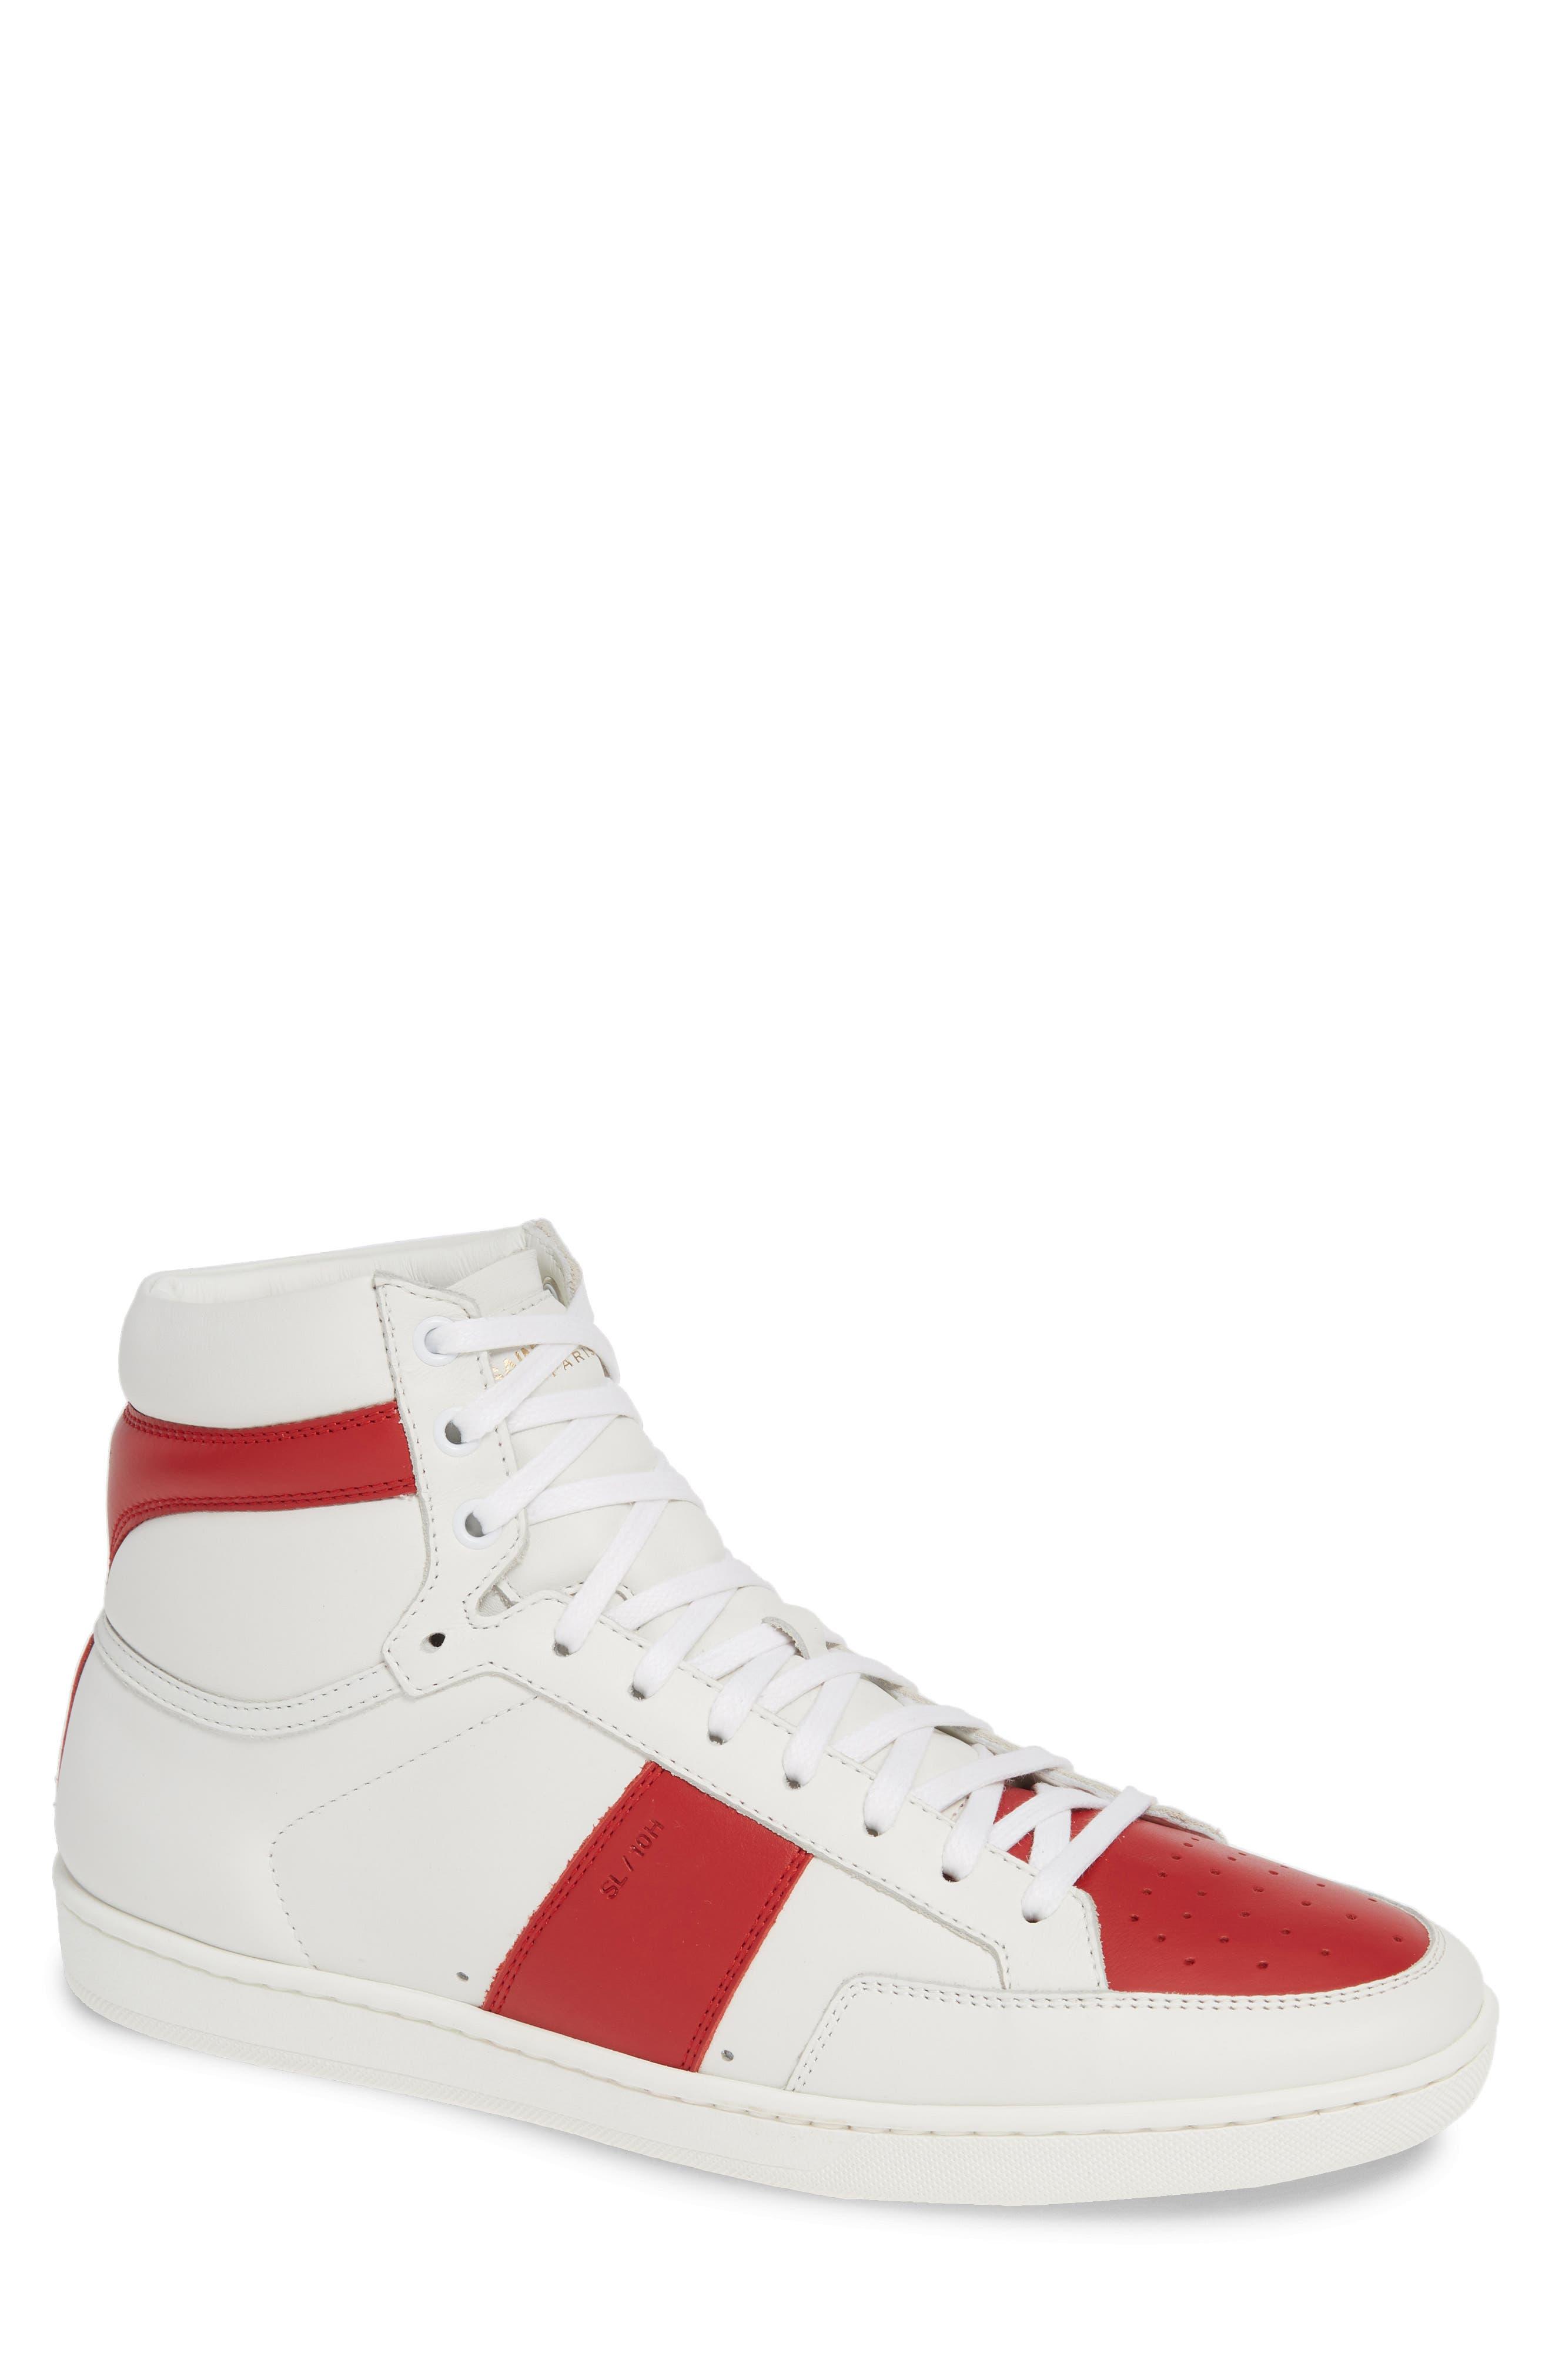 SAINT LAURENT SL/10H Signature Court Classic High-Top Sneaker, Main, color, WHITE/ MULTI